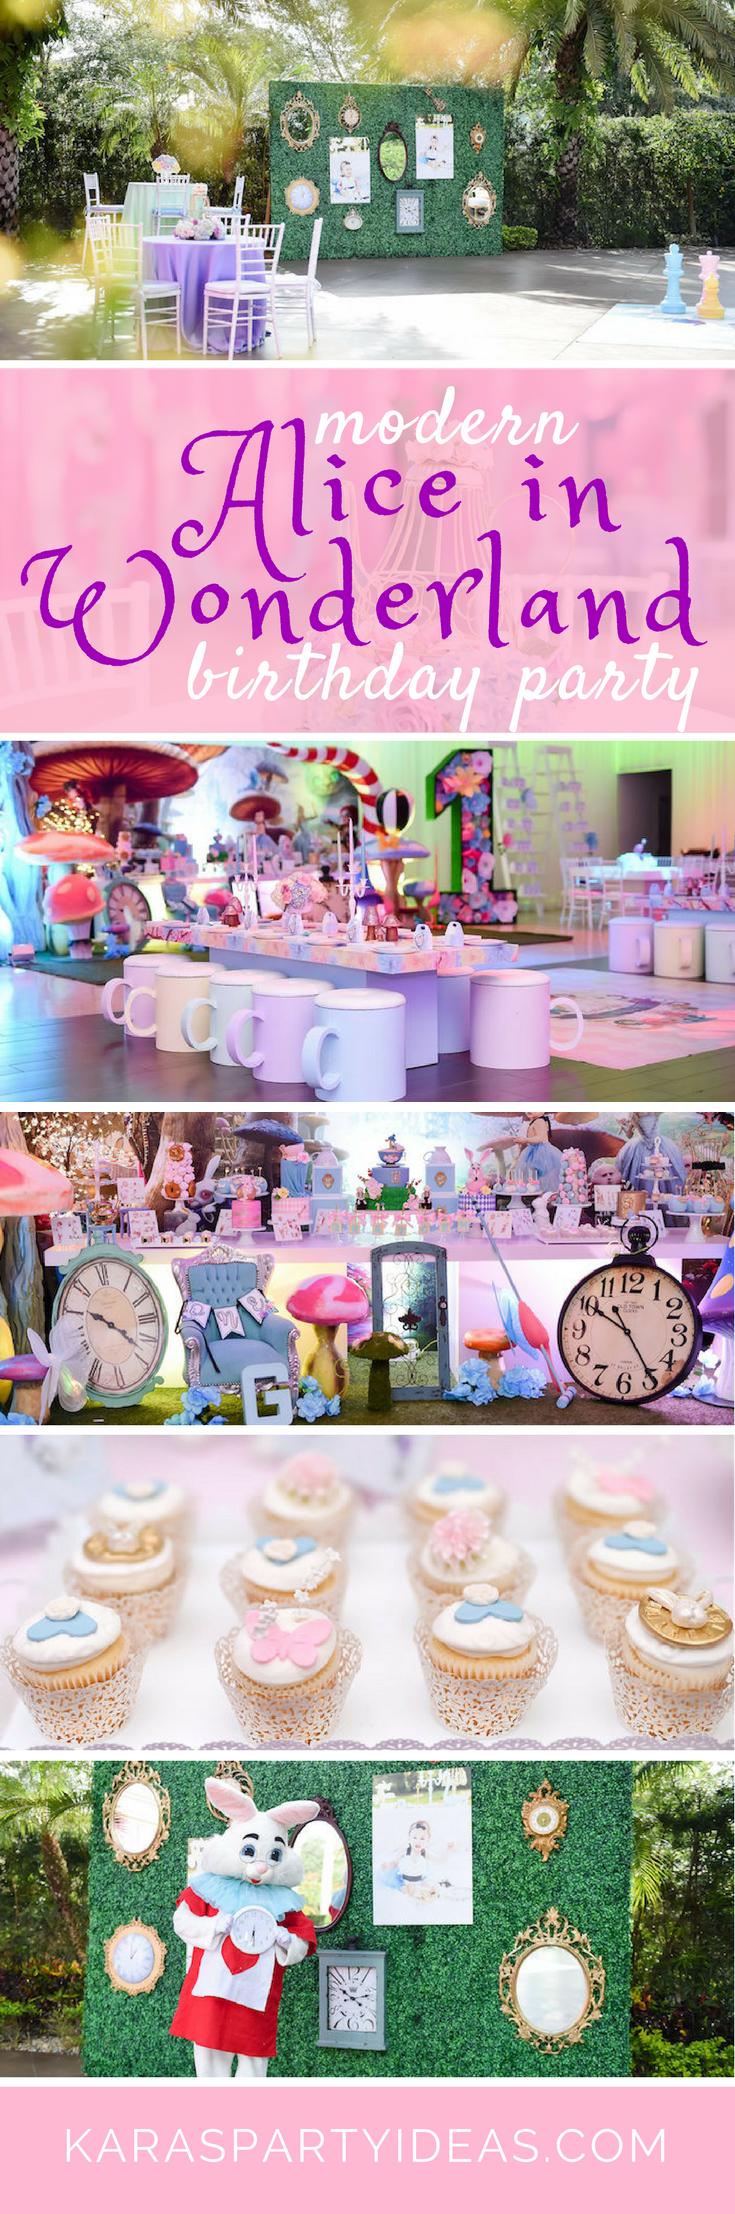 Modern Alice in Wonderland Birthday Party - Karas Party Ideas via KarasPartyIdeas.com